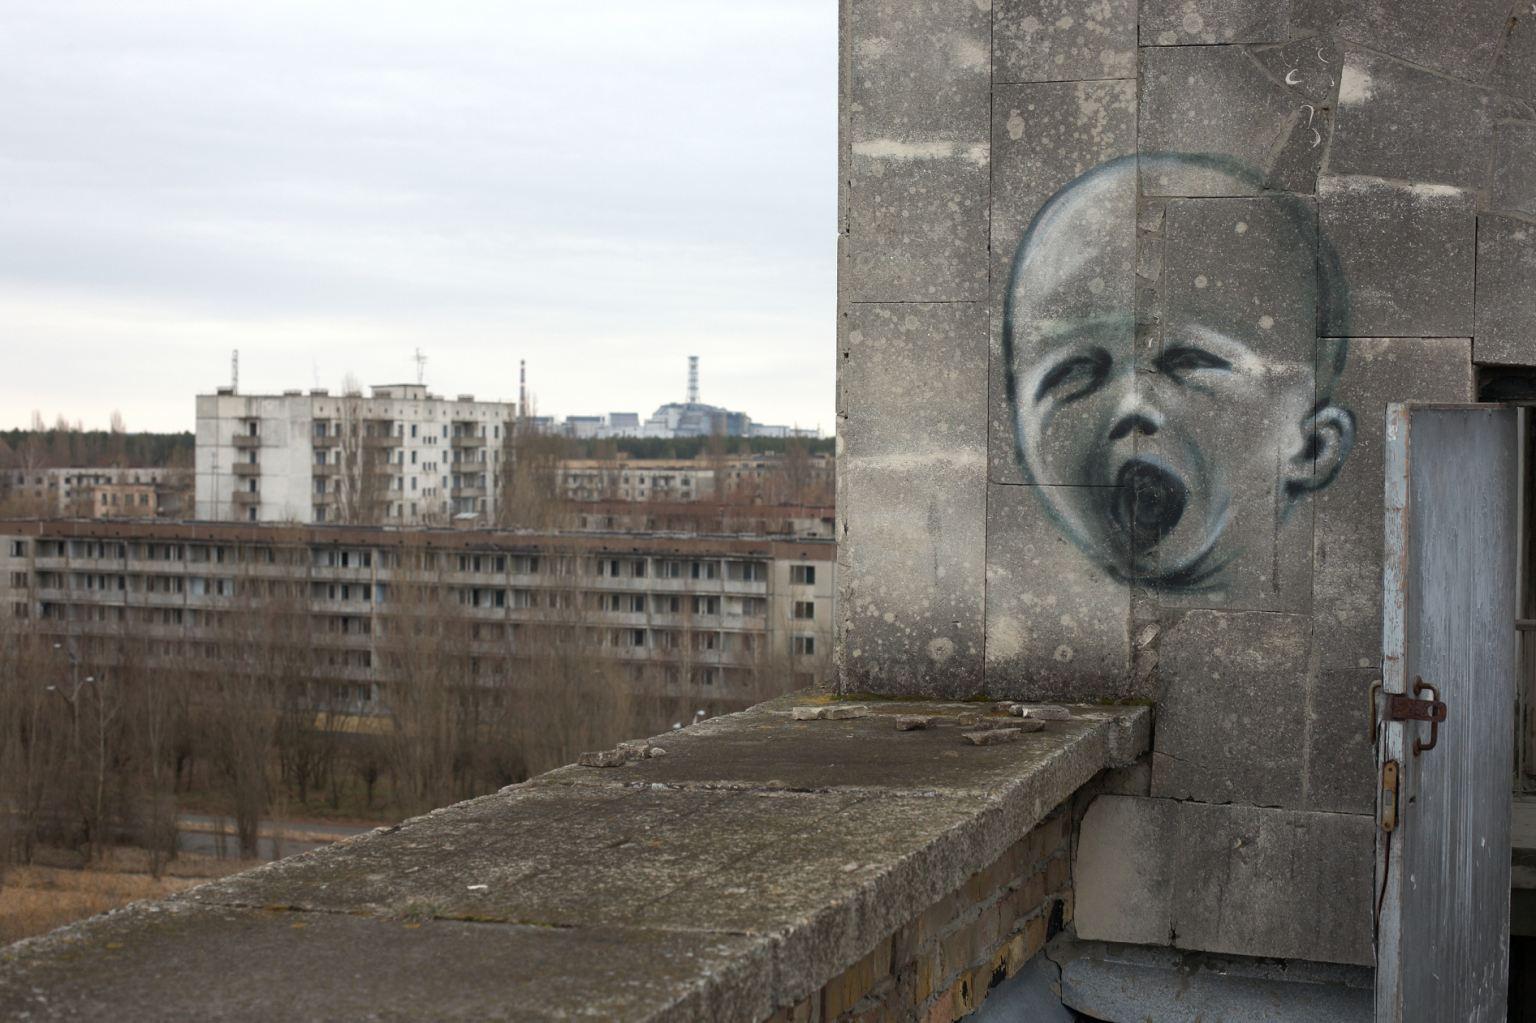 Graffiti of a crying baby on a wall, Chernobyl Power Plant, Chernobyl, Ukraine